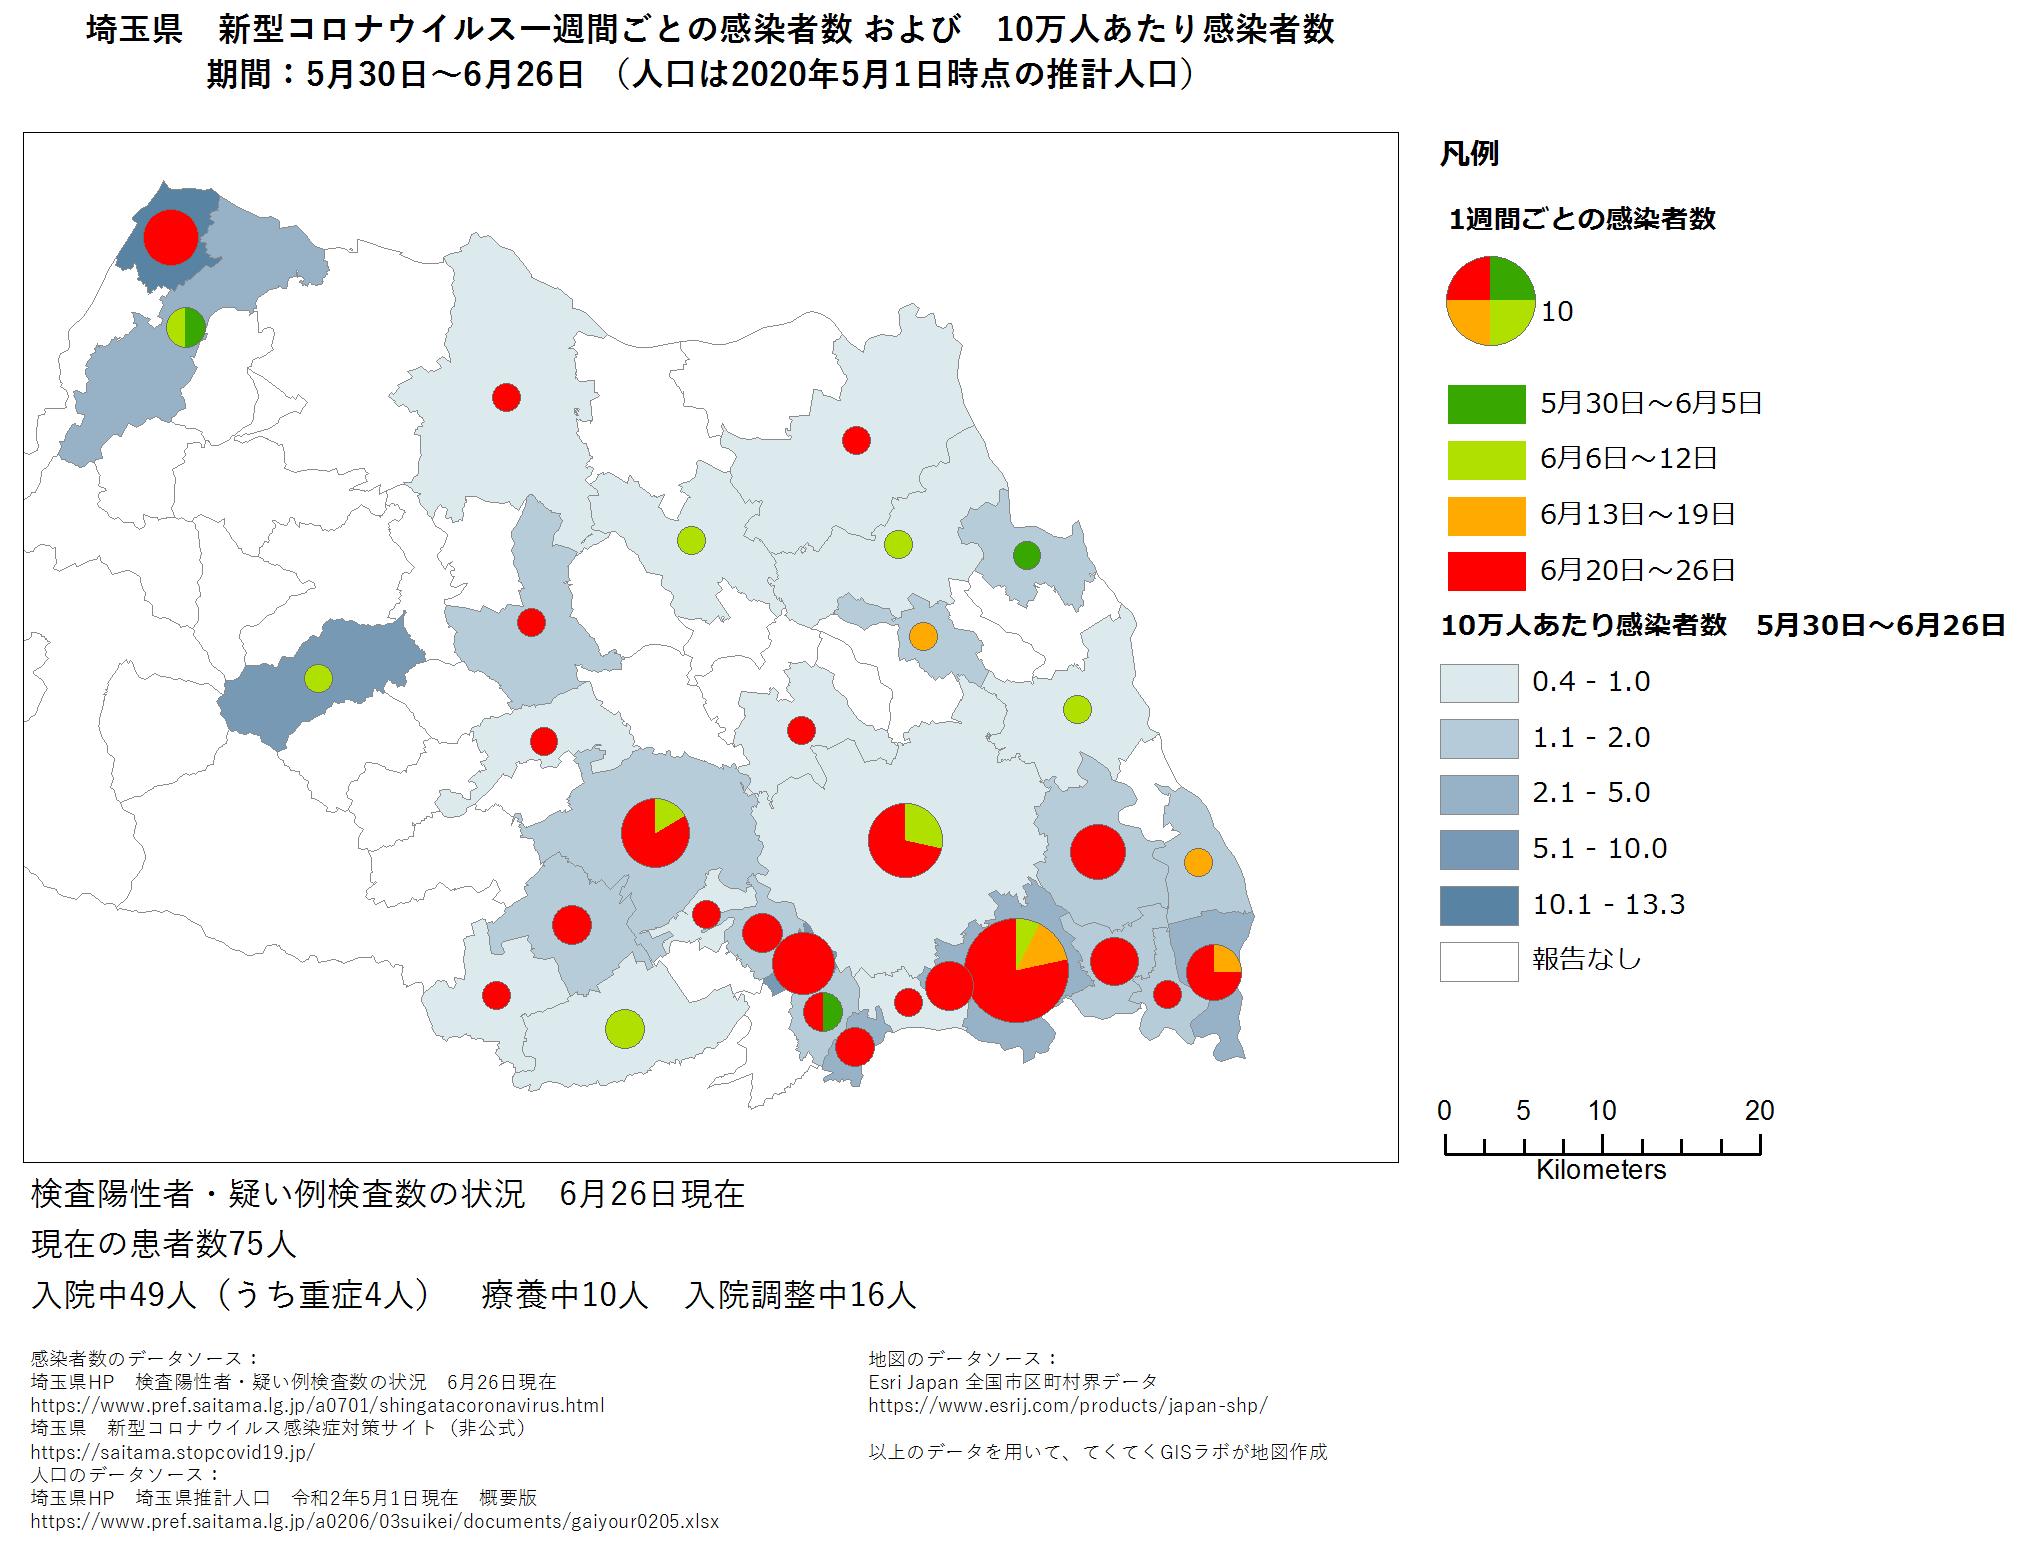 1週間ごと感染者数、埼玉県、5月30日〜6月26日